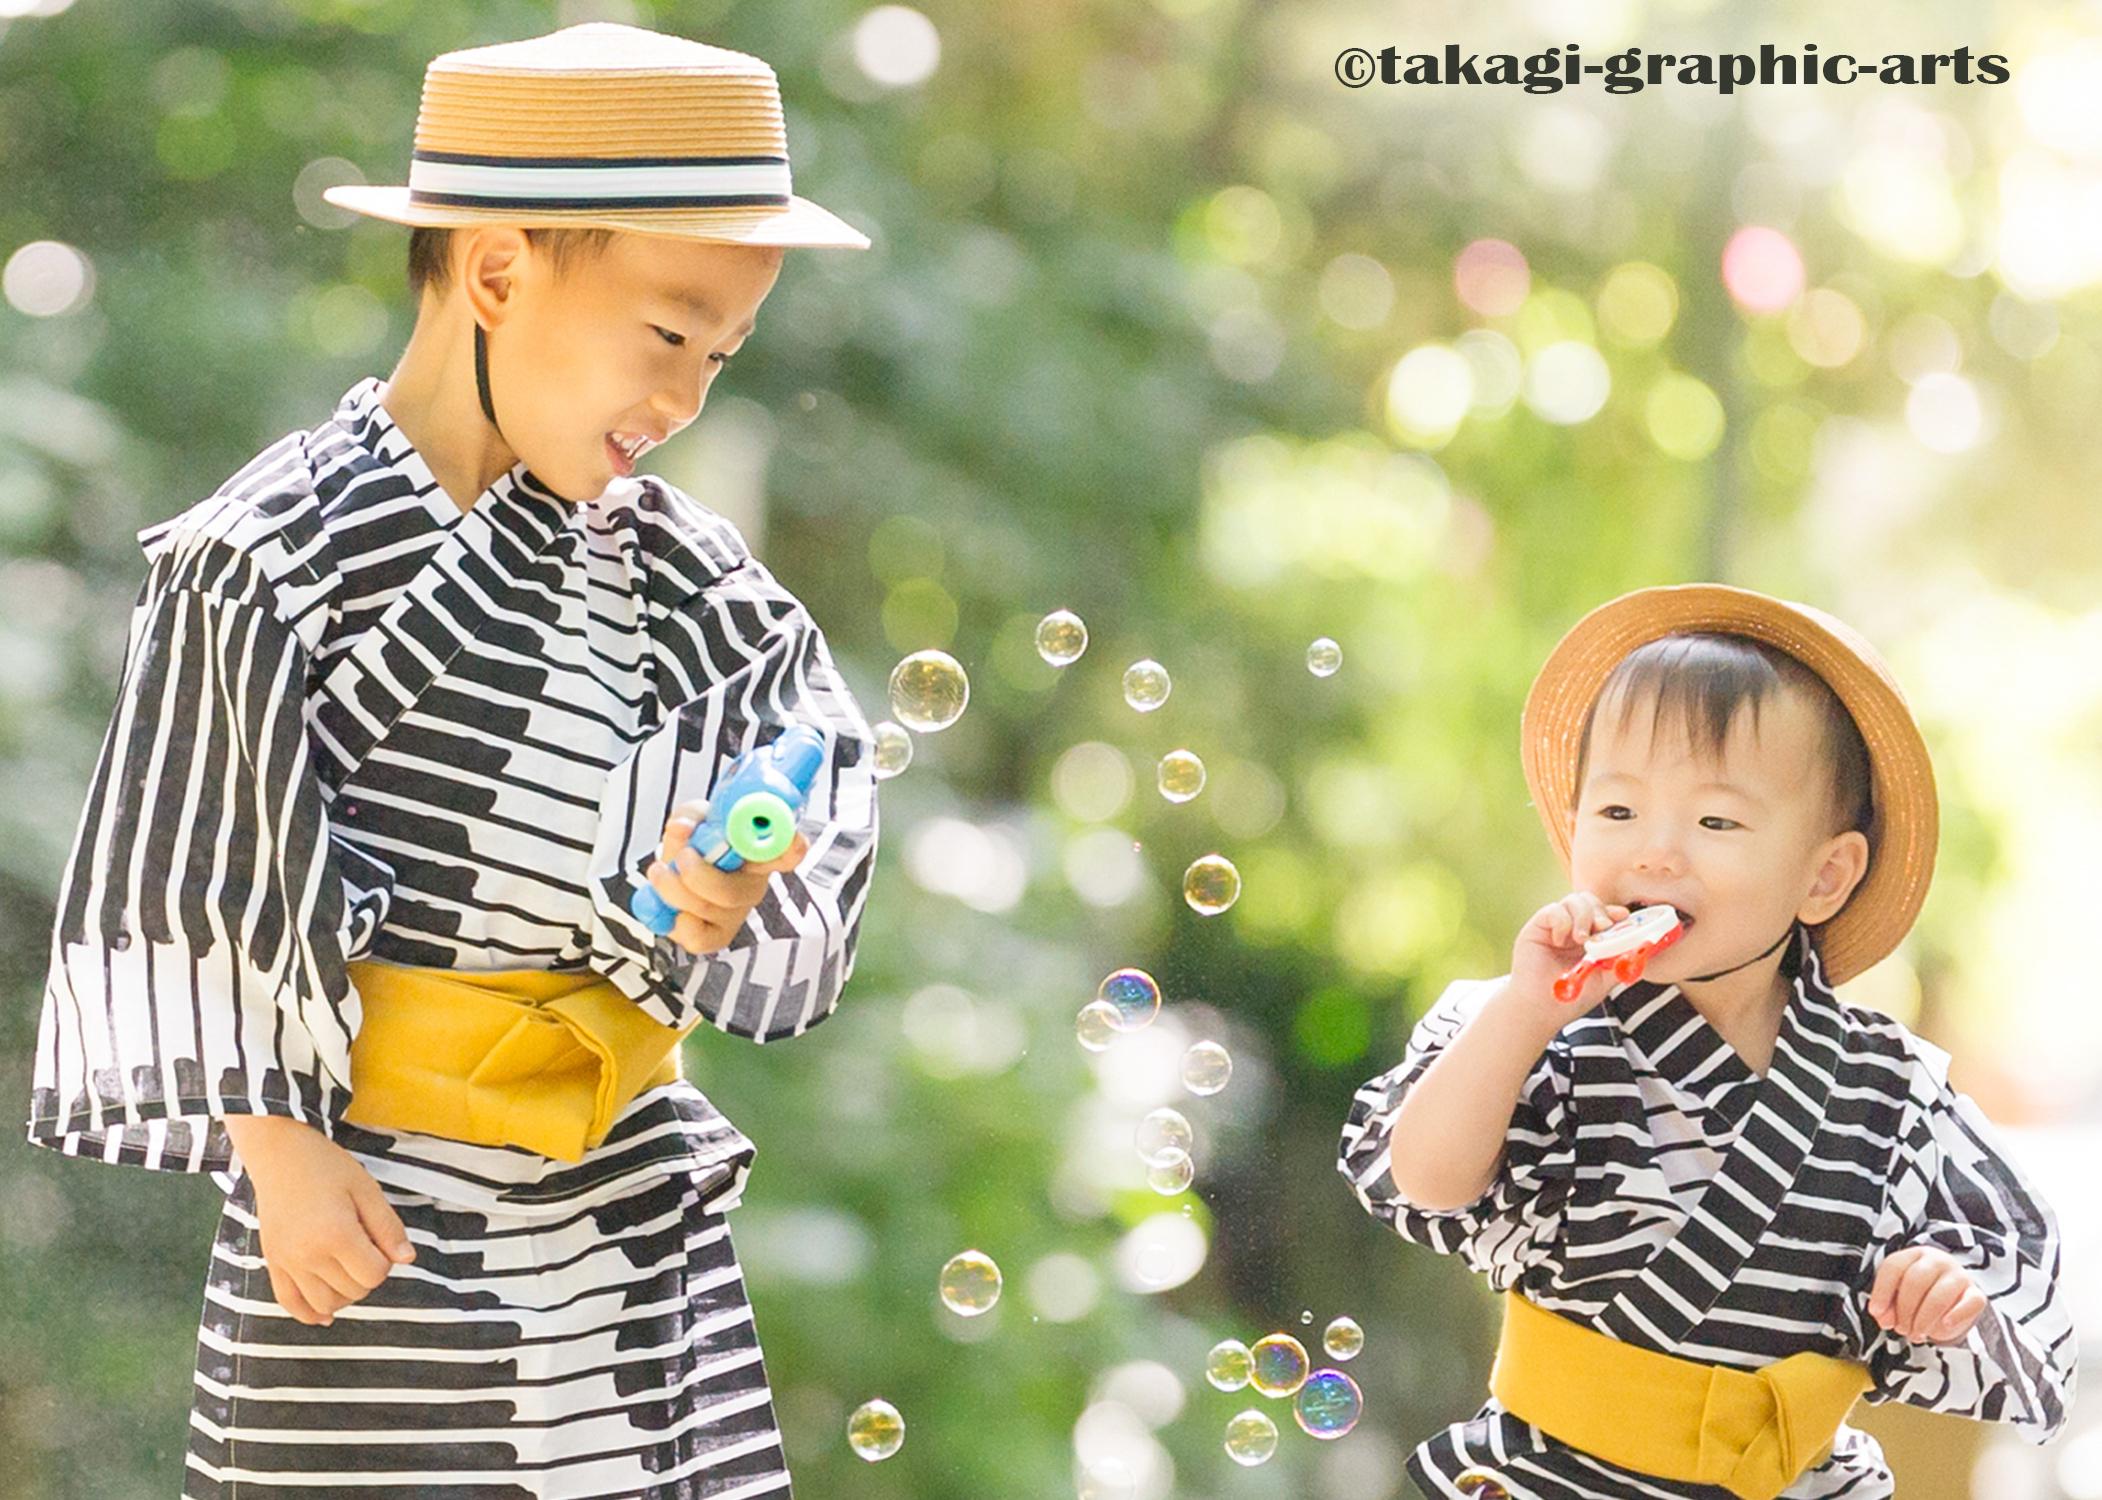 出張撮影/家族写真/旅行/イベント/鎌倉妙本寺